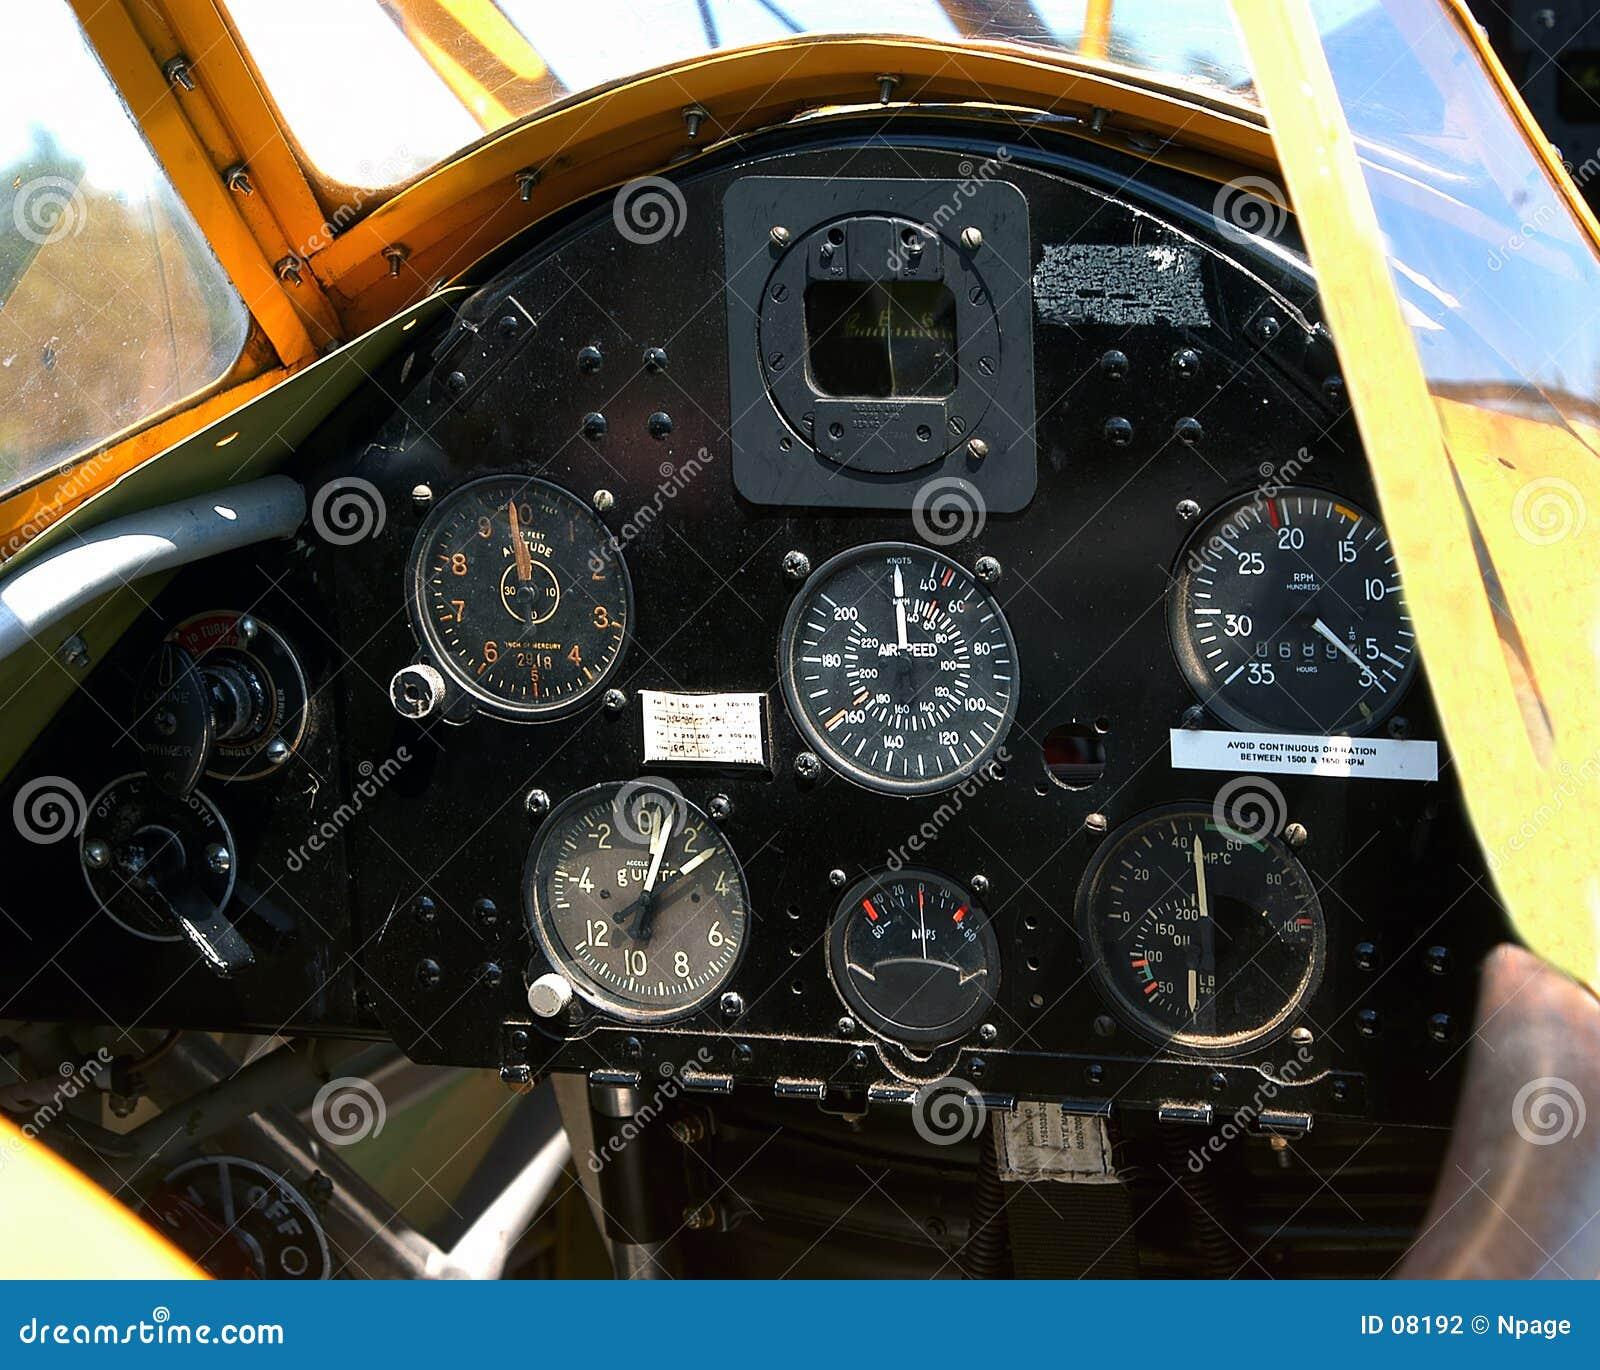 Aircraft Instrument Panel : Aircraft instrument panel stock photo image of antique